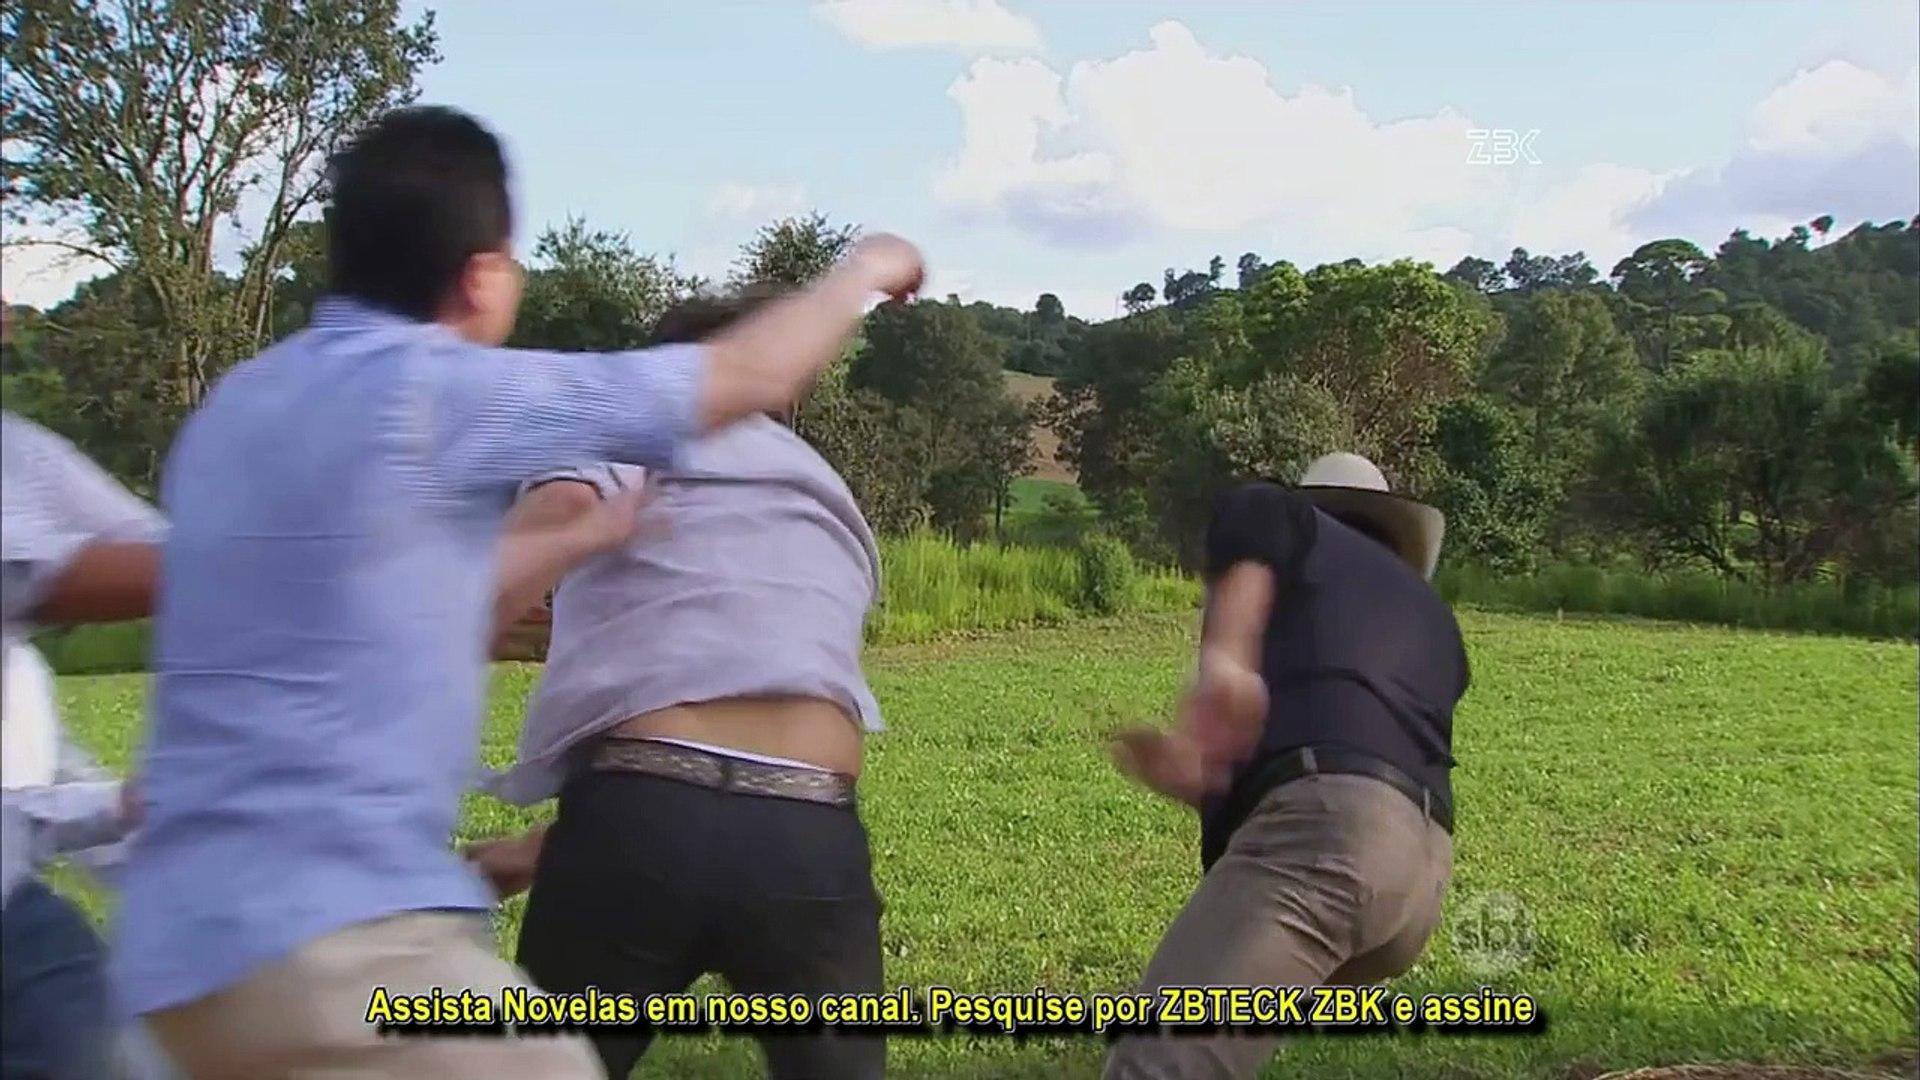 Coração Indomável HD Otávio e Álvaro trocam socos SEM CORTES